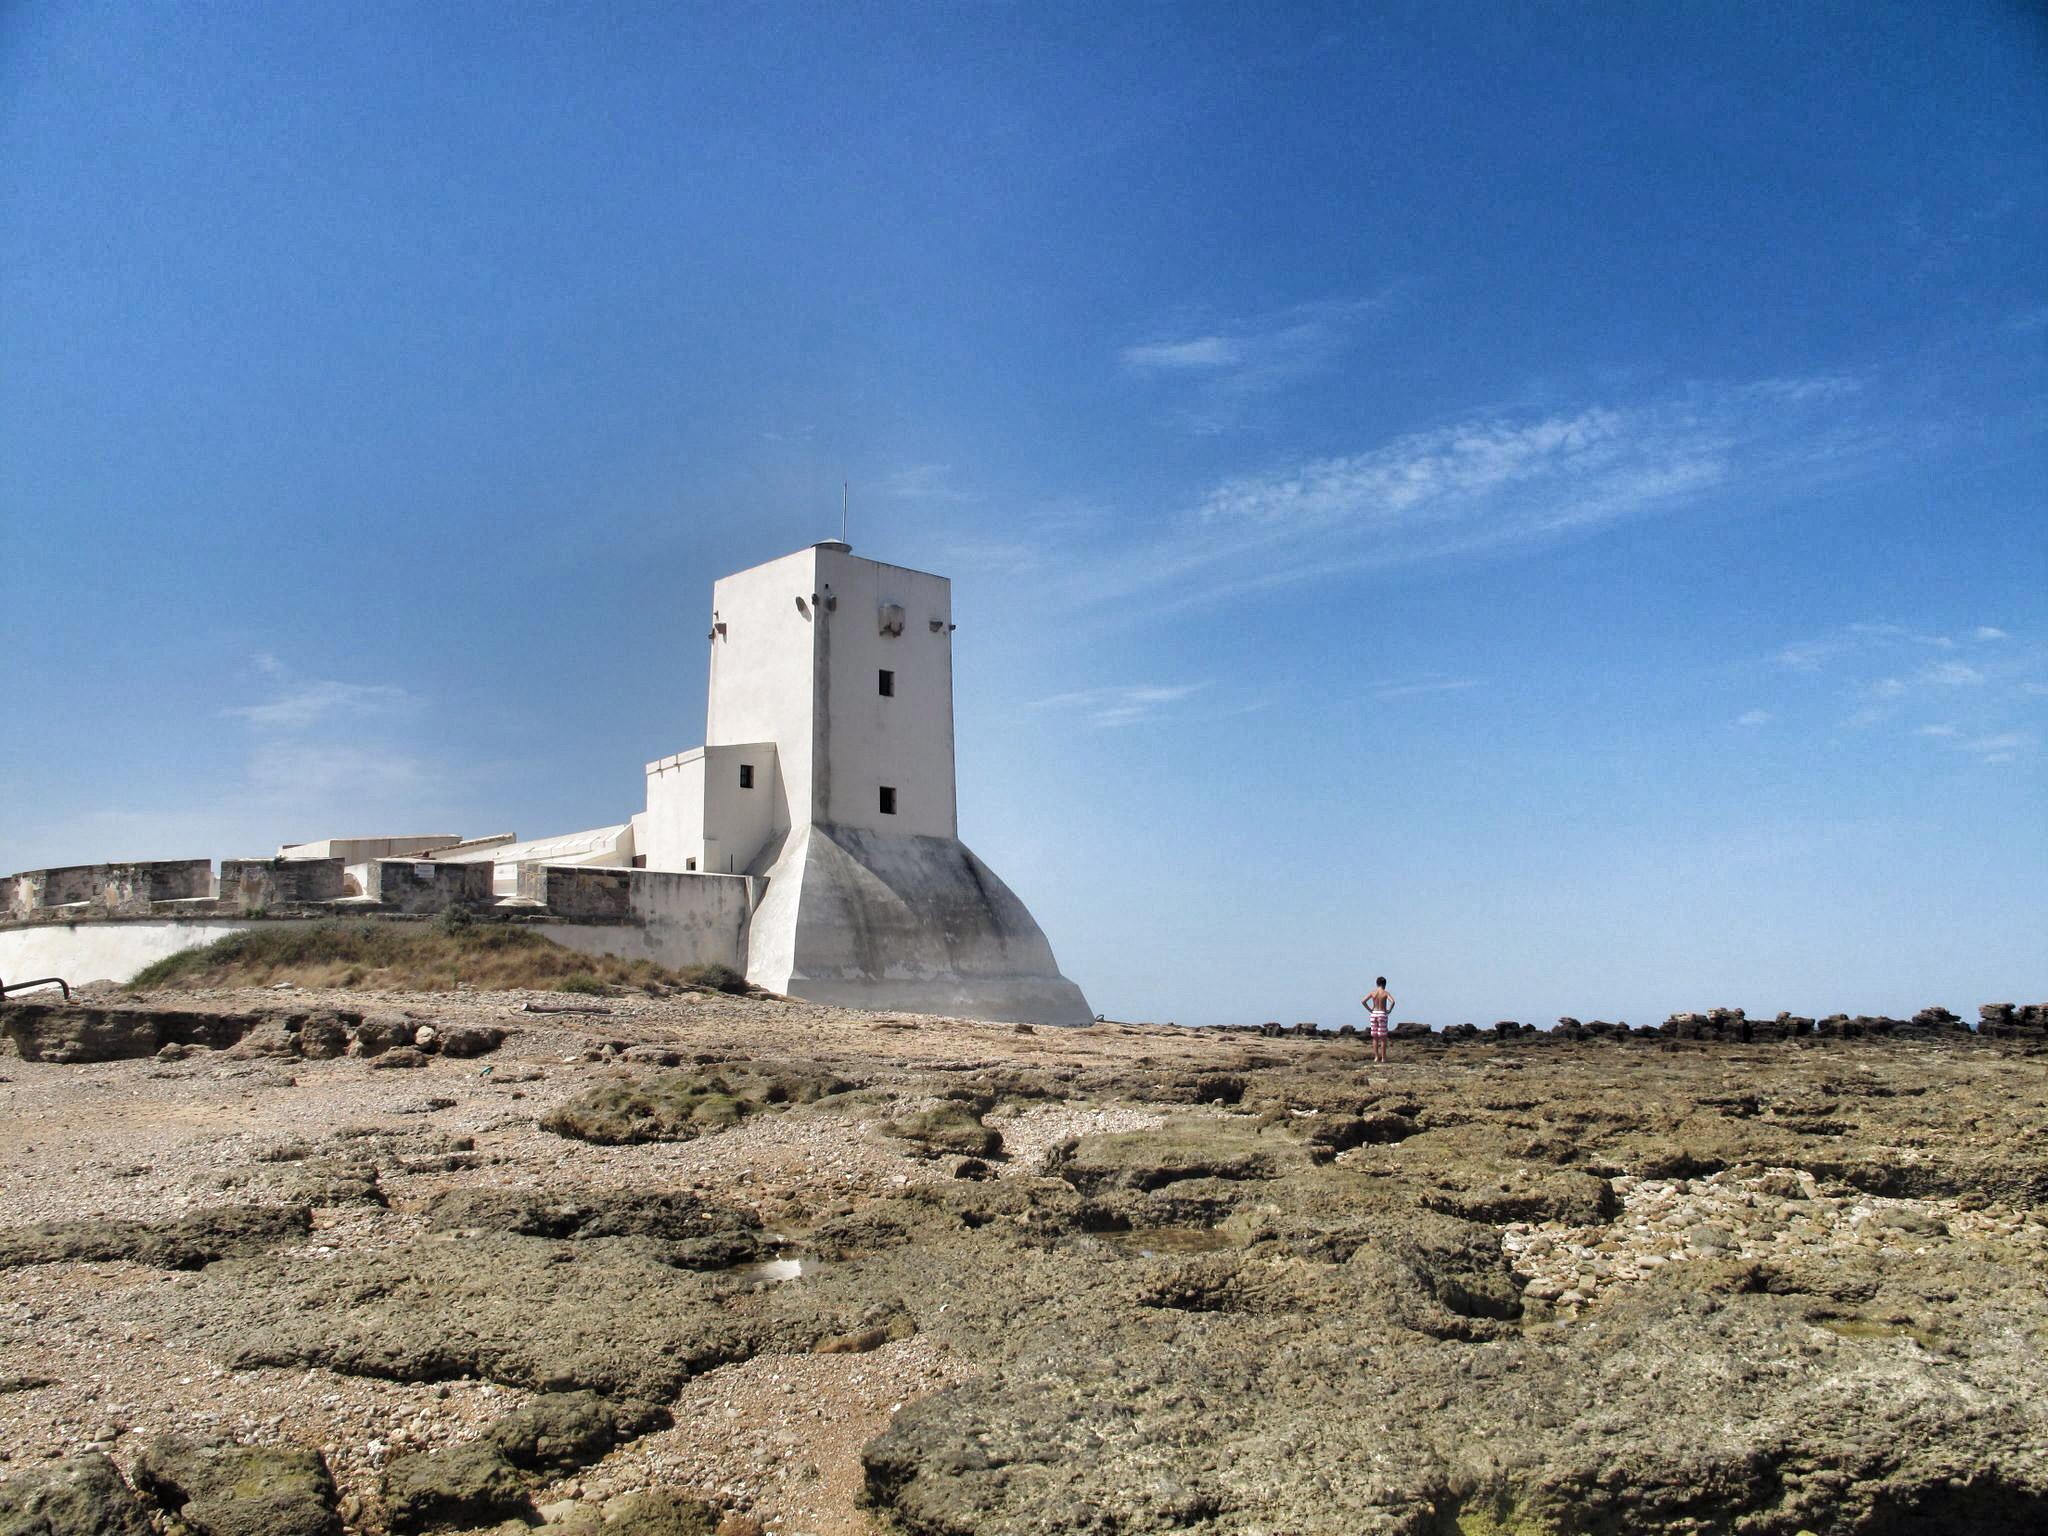 castillo sancti petri_torre_kayak